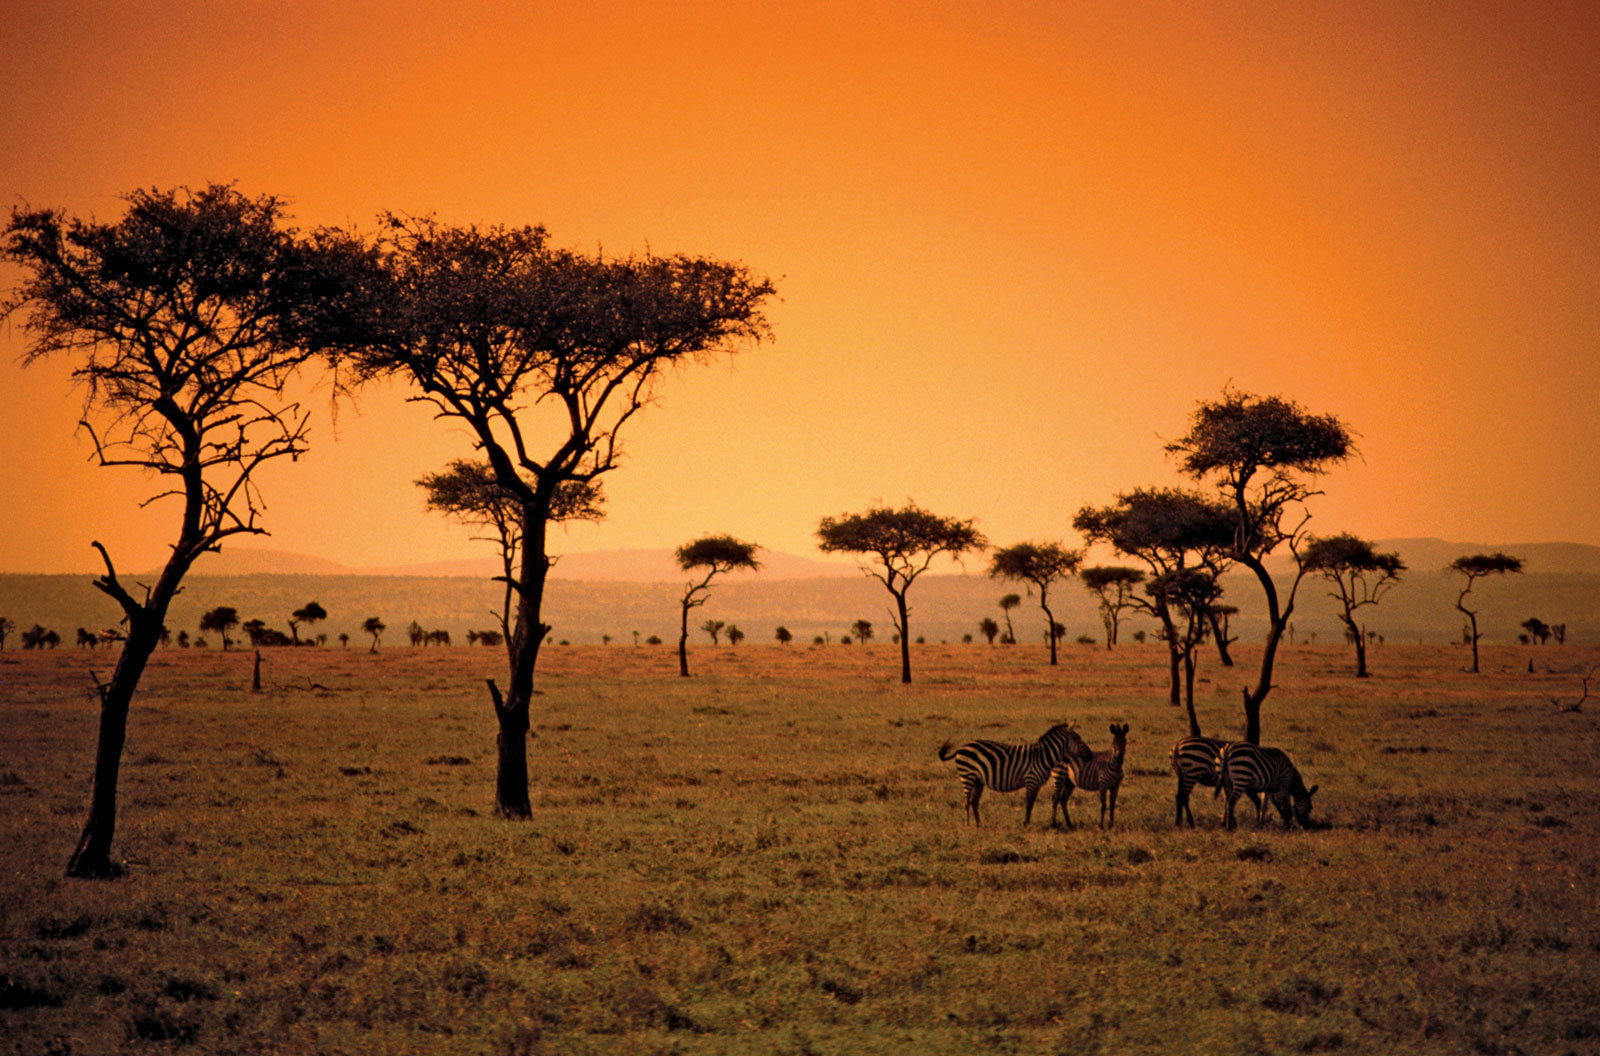 sun-savanna-African-Kenya-country.jpg